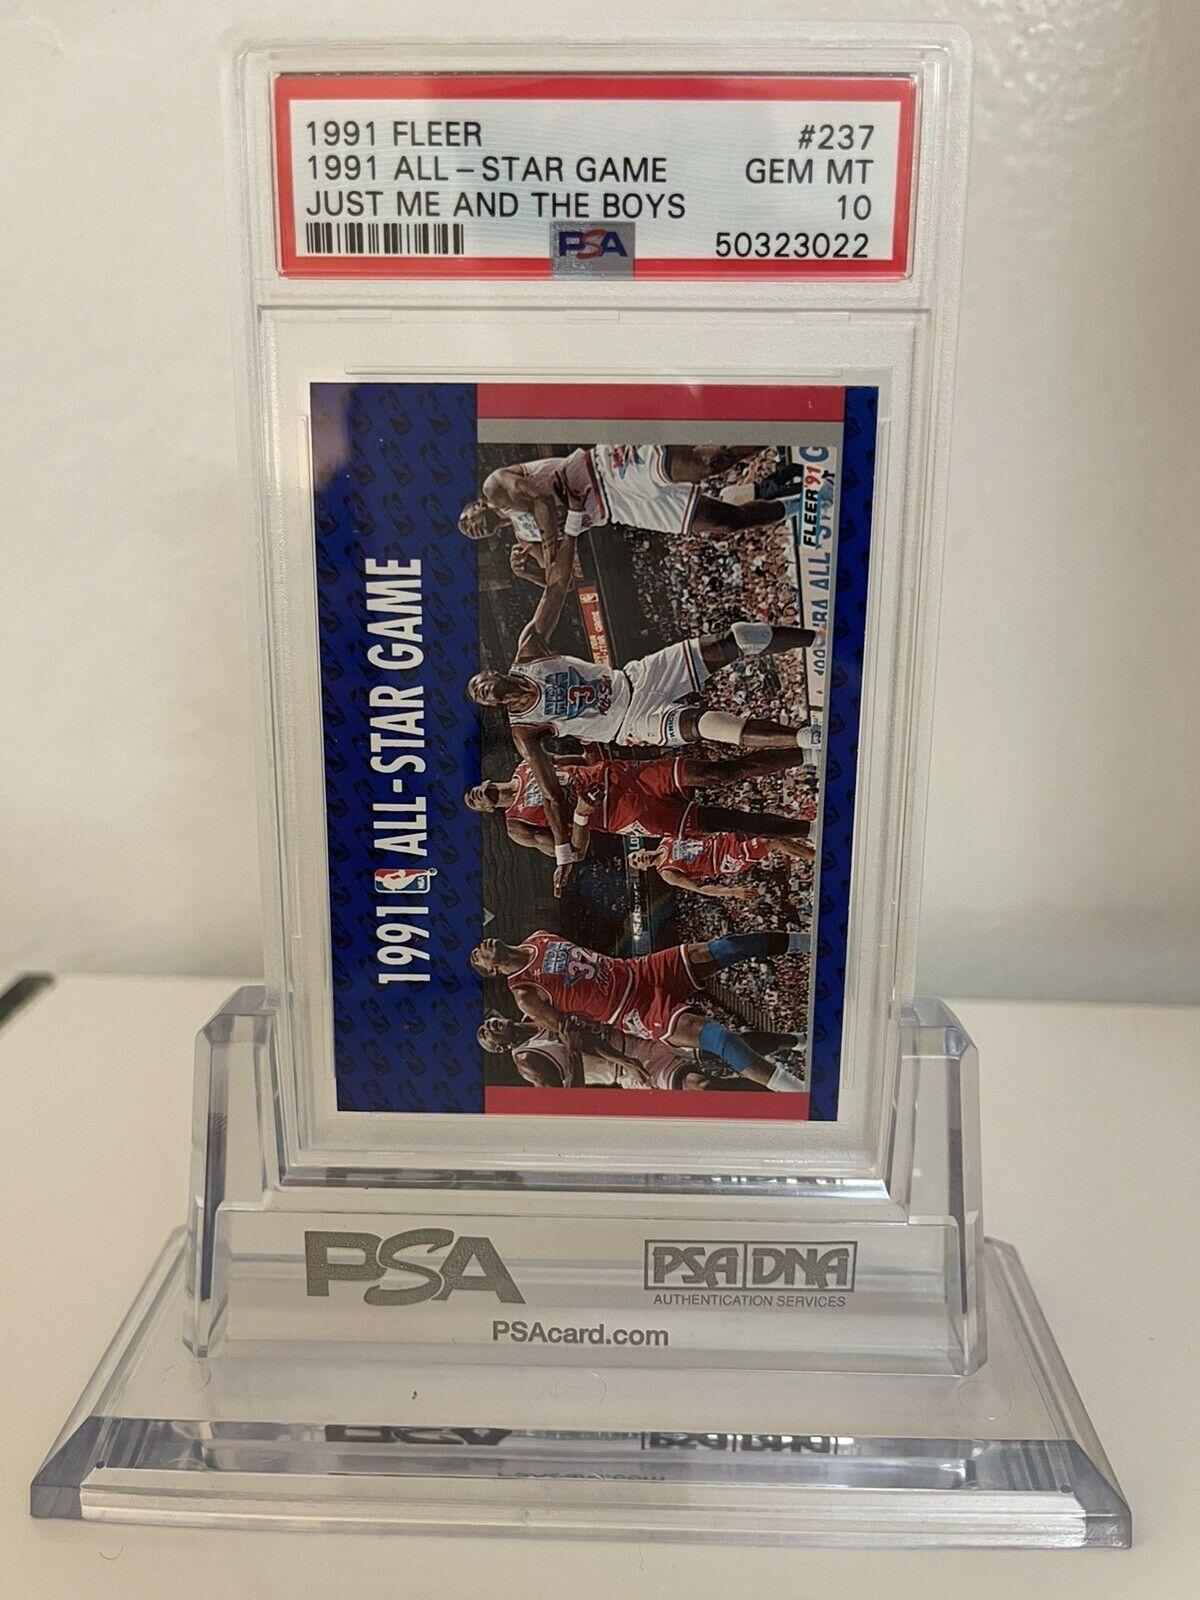 Valuable david robinson basketball cards